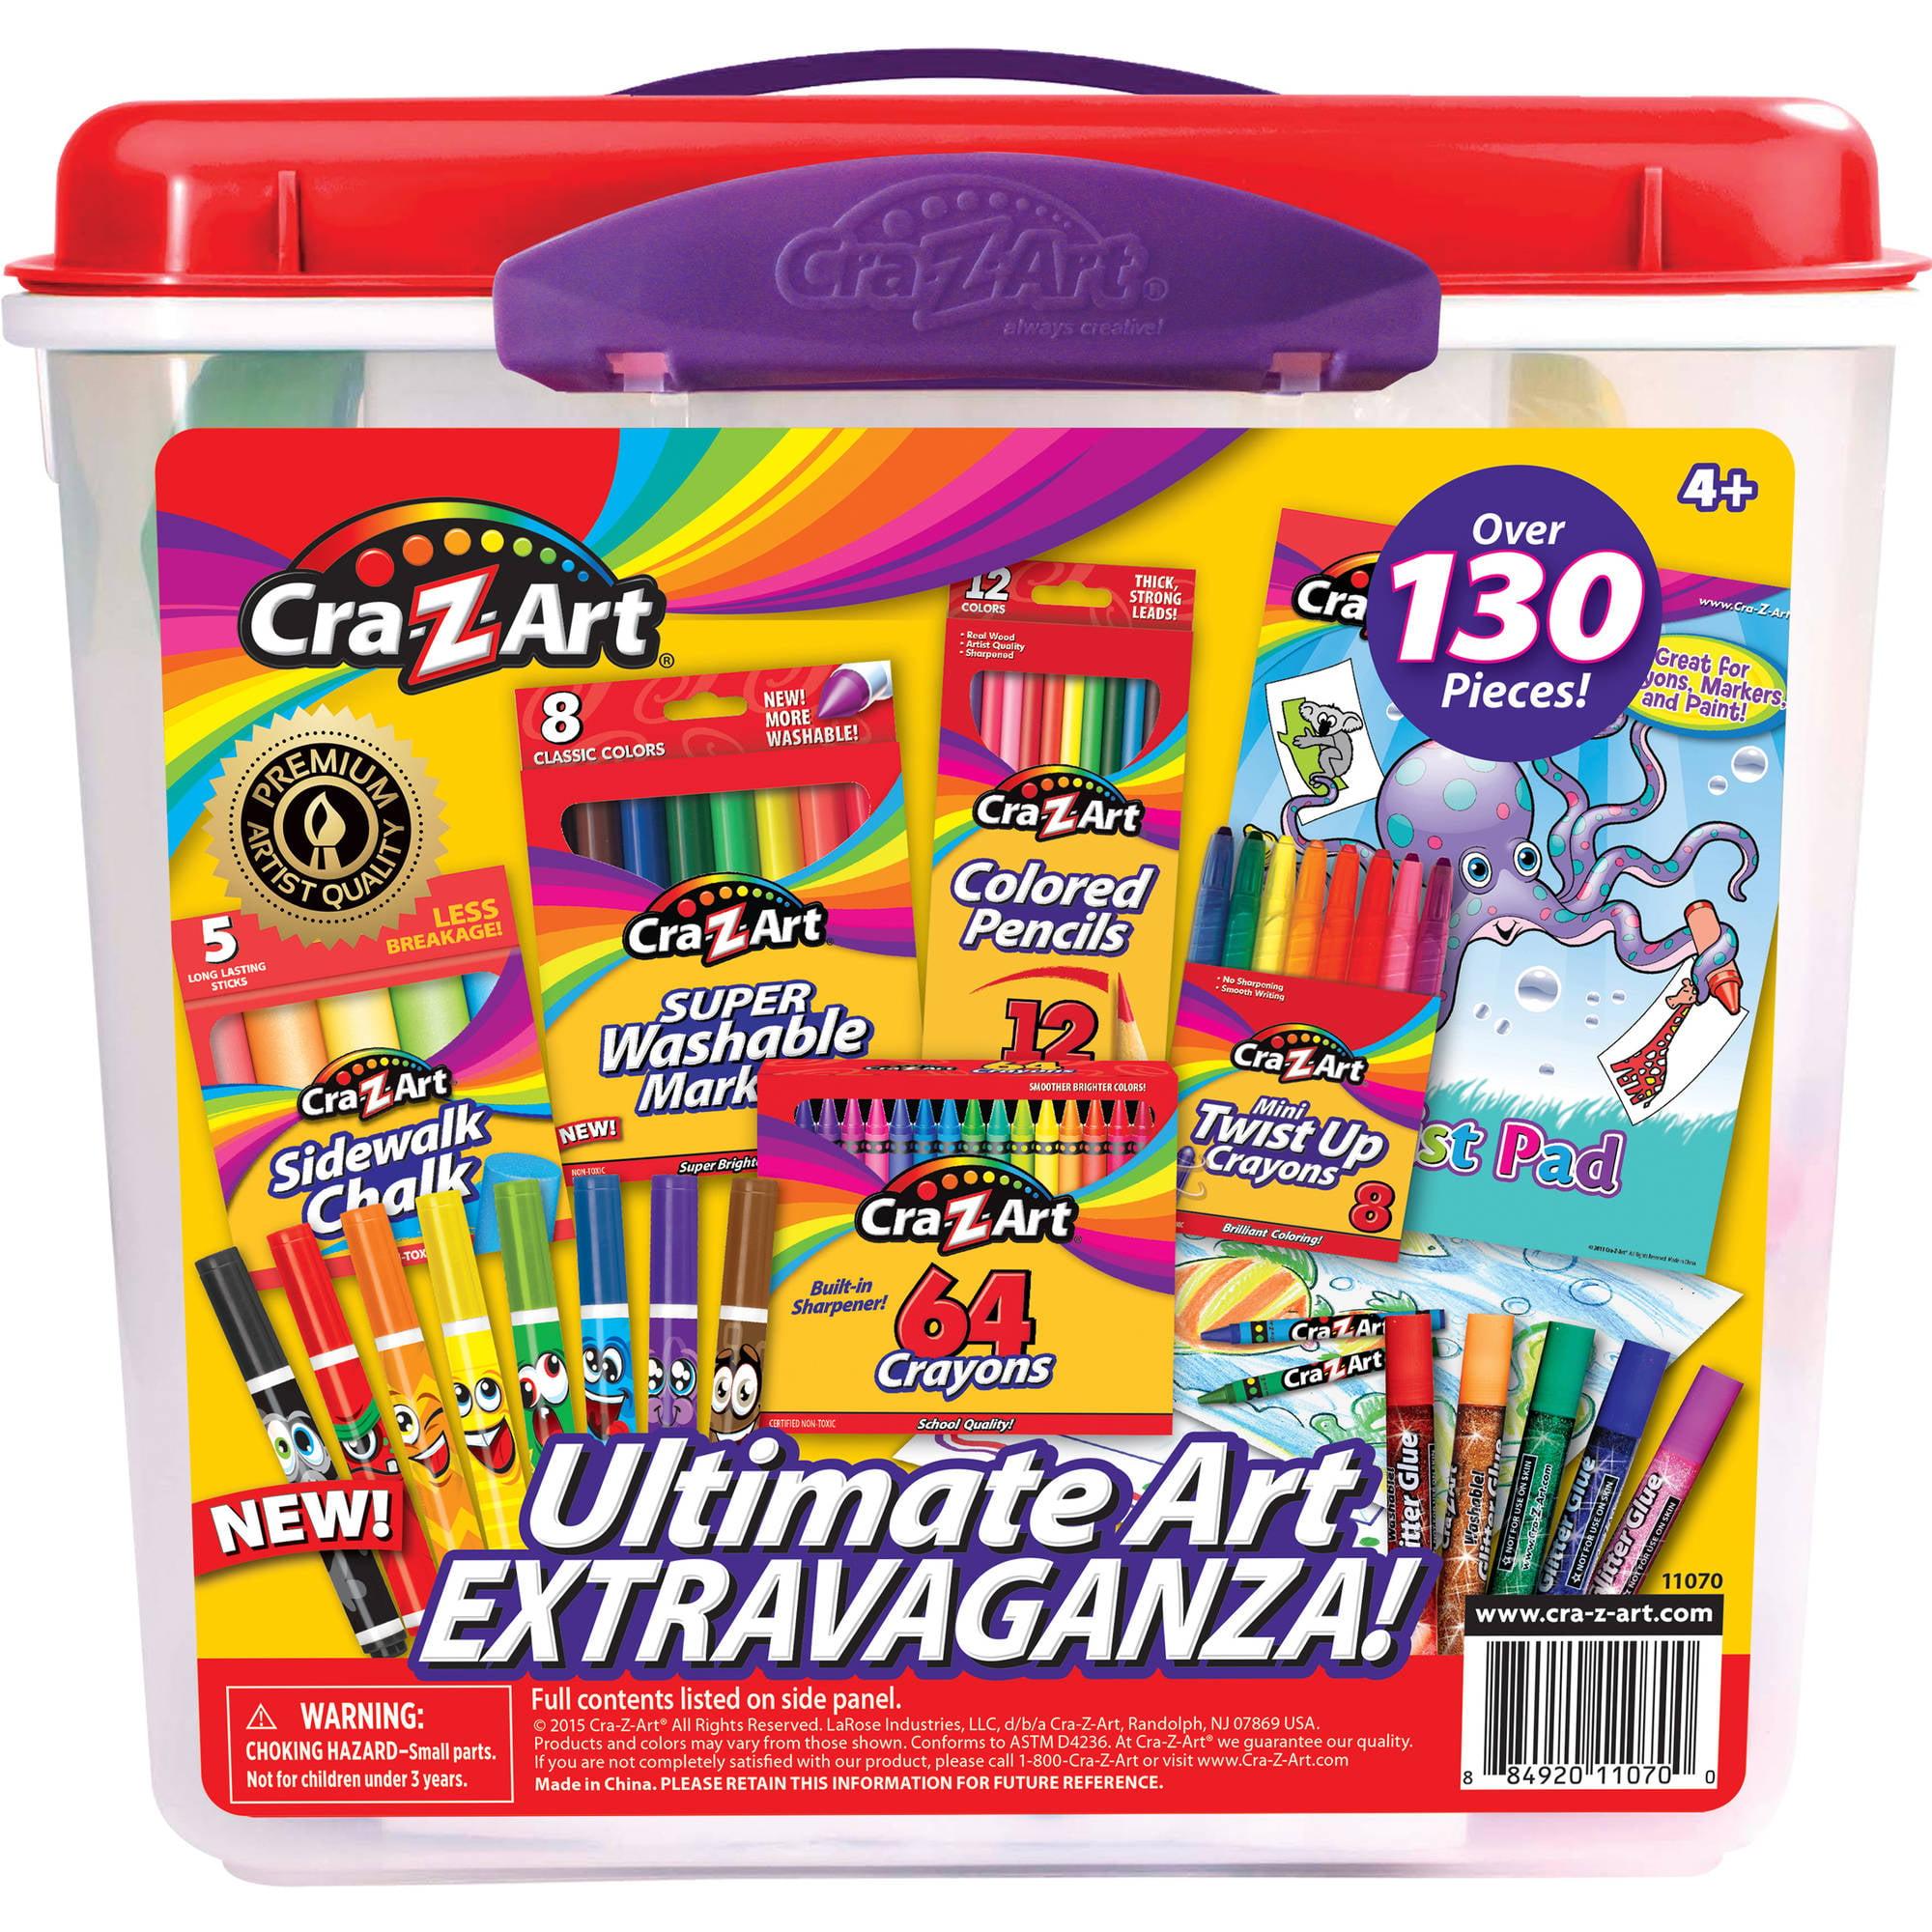 Cra-Z-Art Ultimate Art Tub by La Rose Industries, LLC.